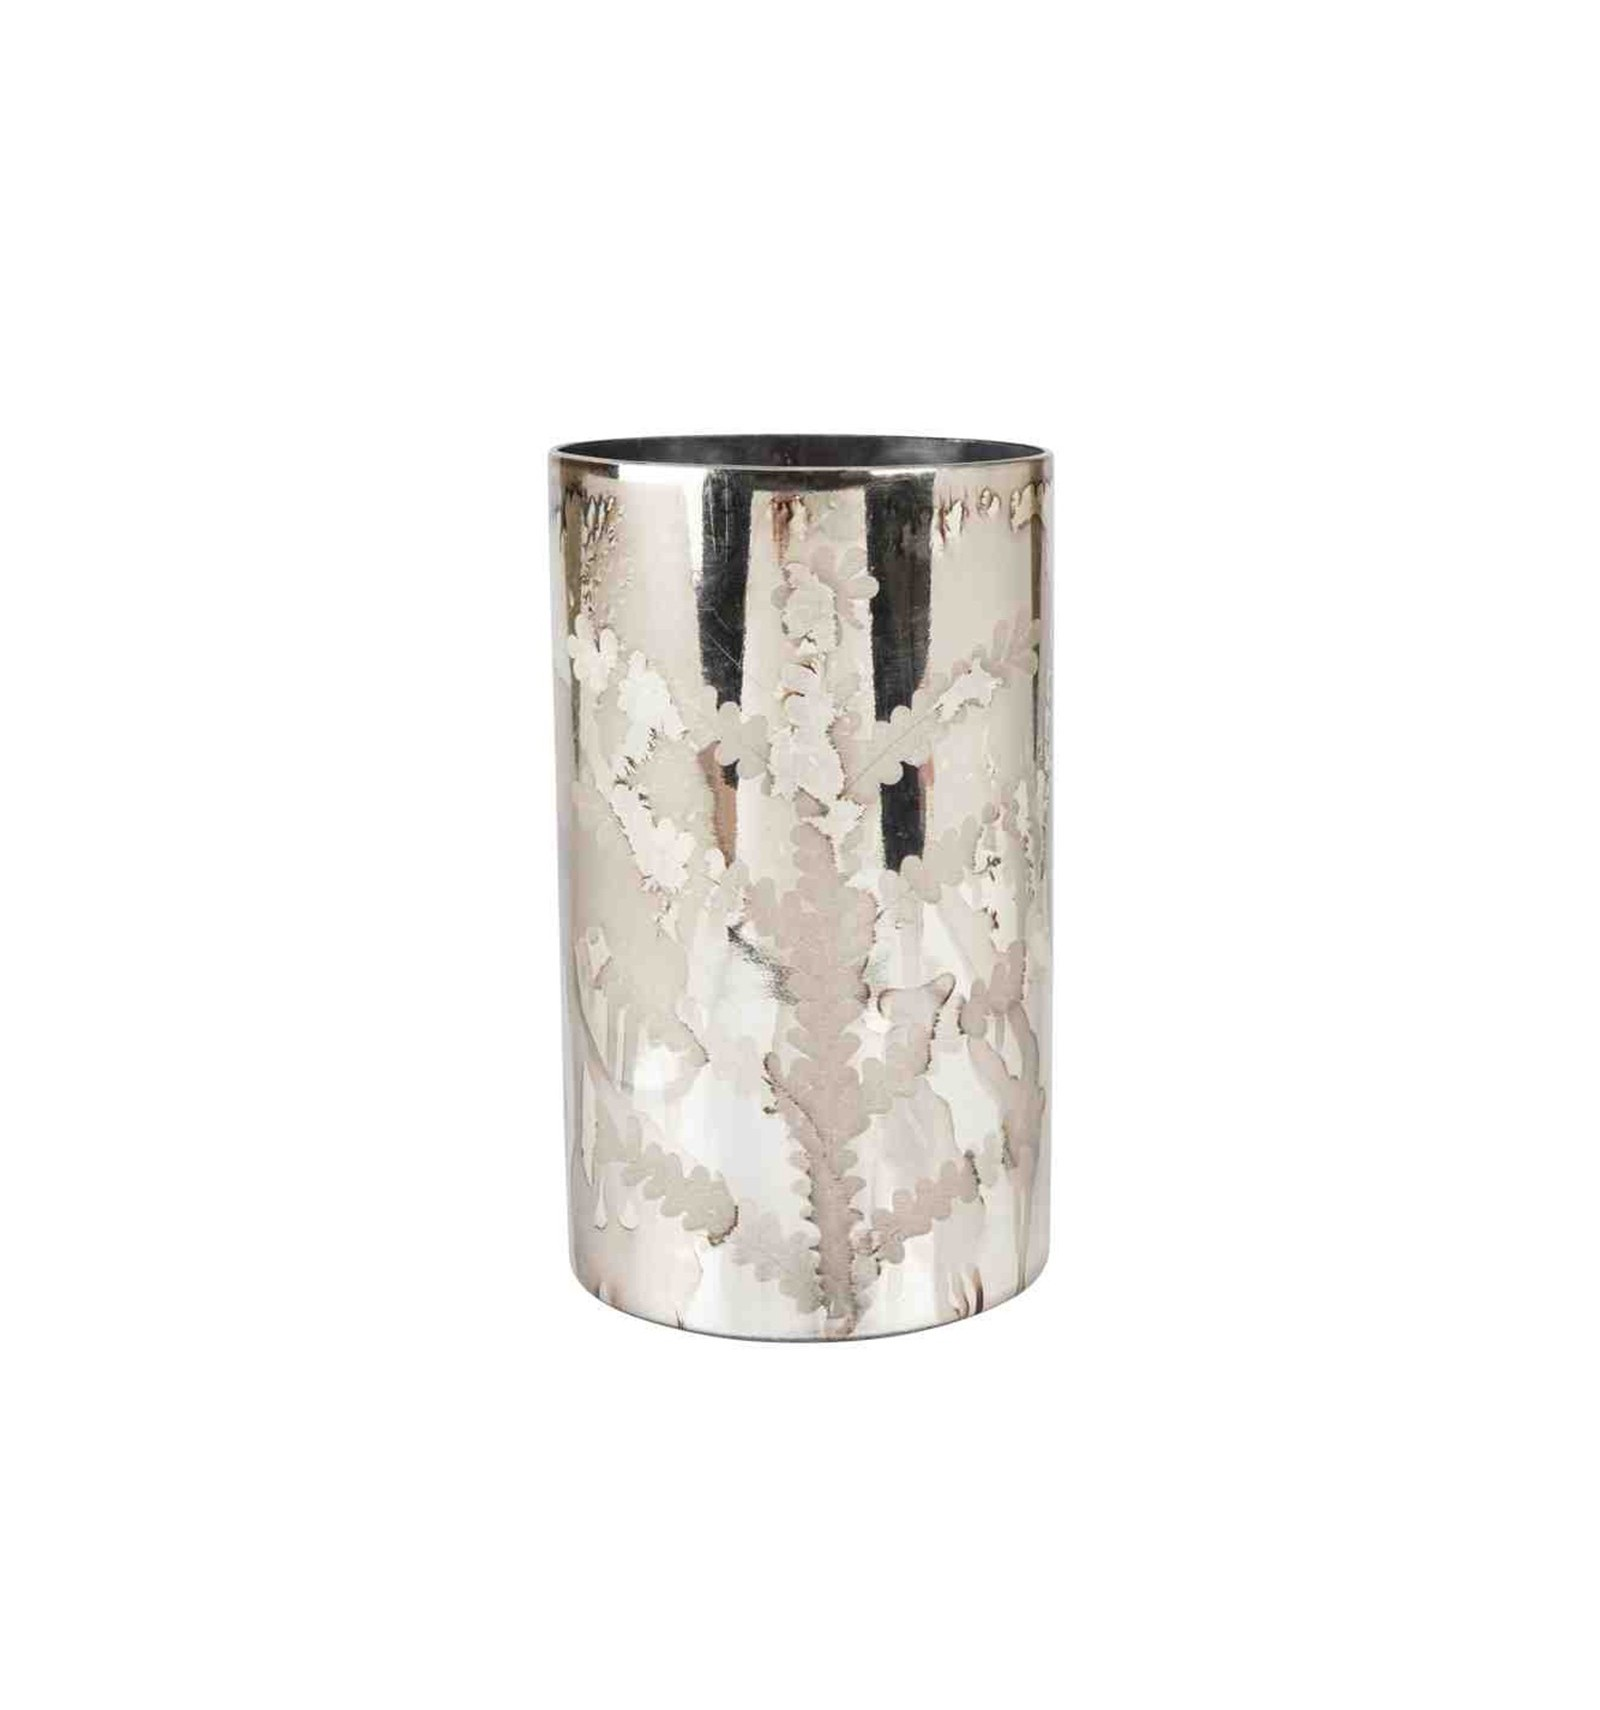 Jarr n cristal envejecido h25 d15cm apia for Jarron cristal